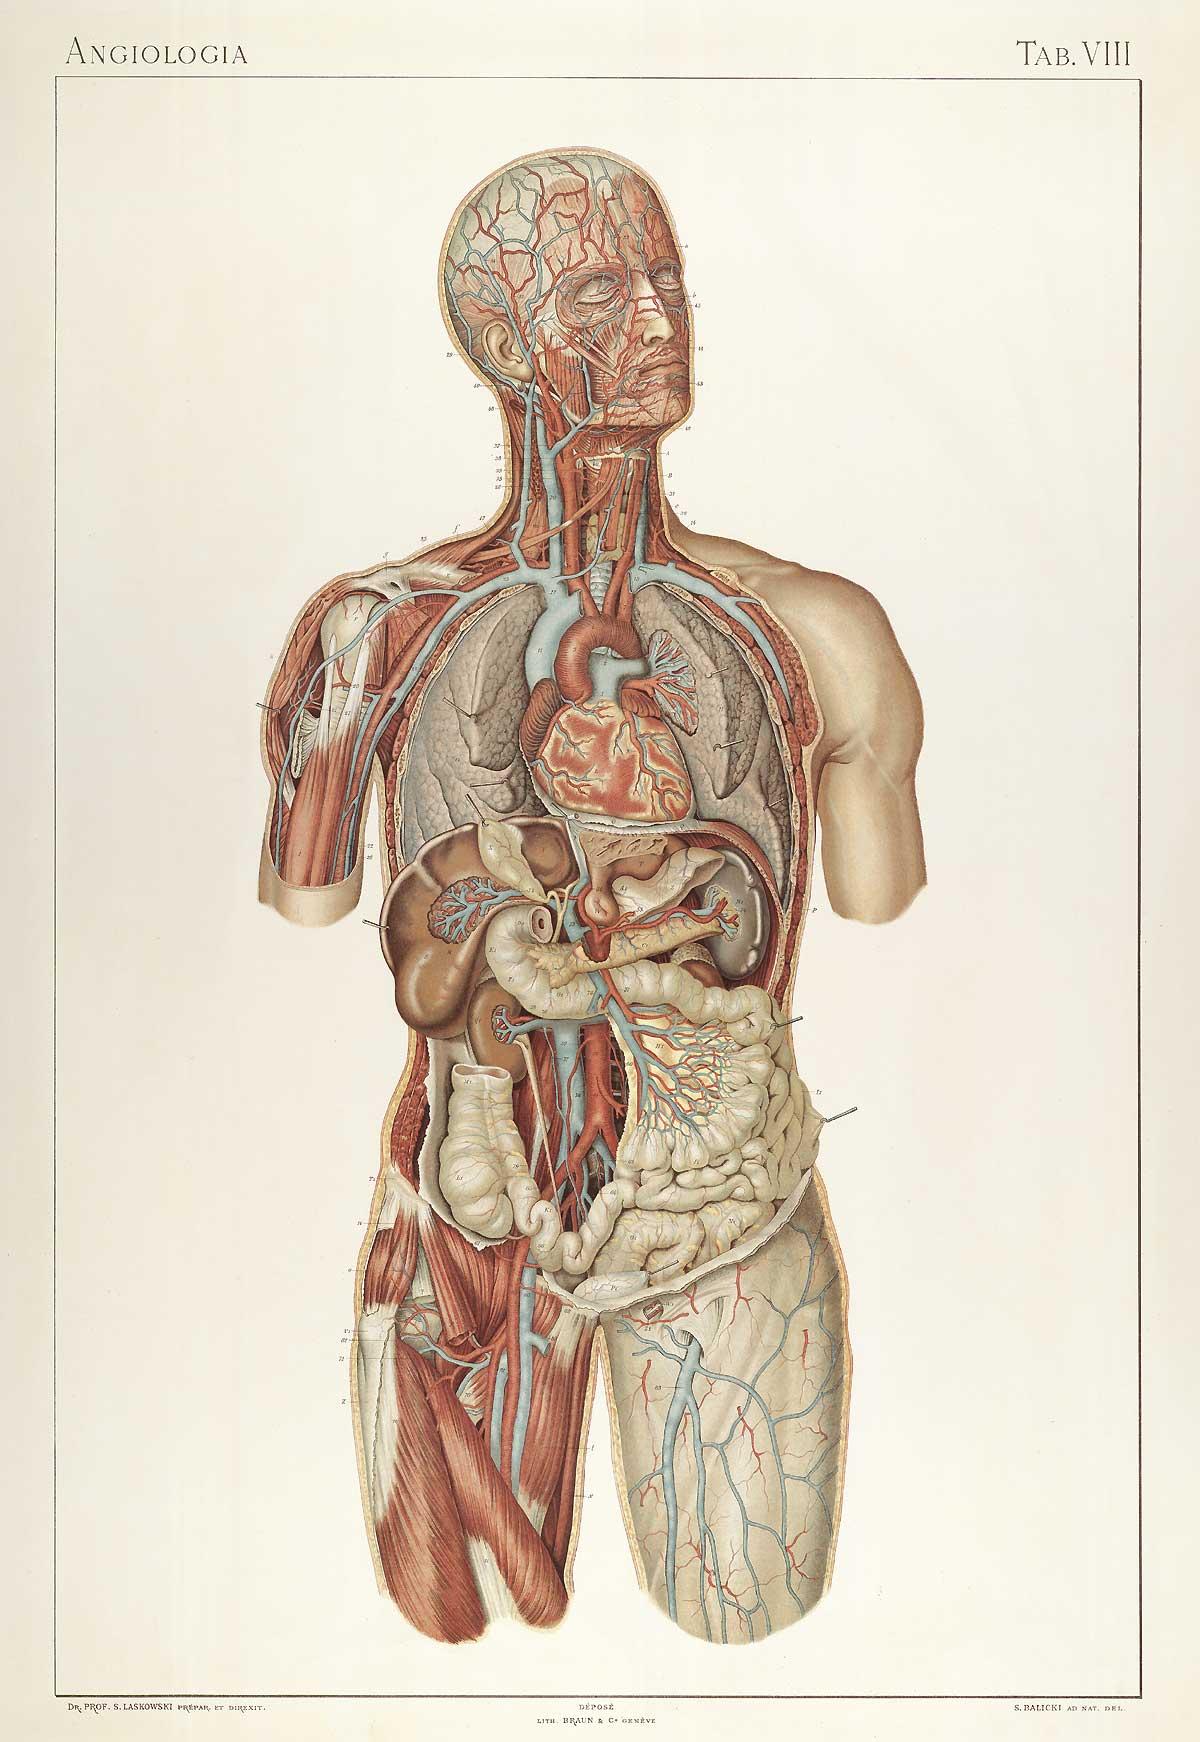 Medecine Litterature Liste De 42 Livres Babelio